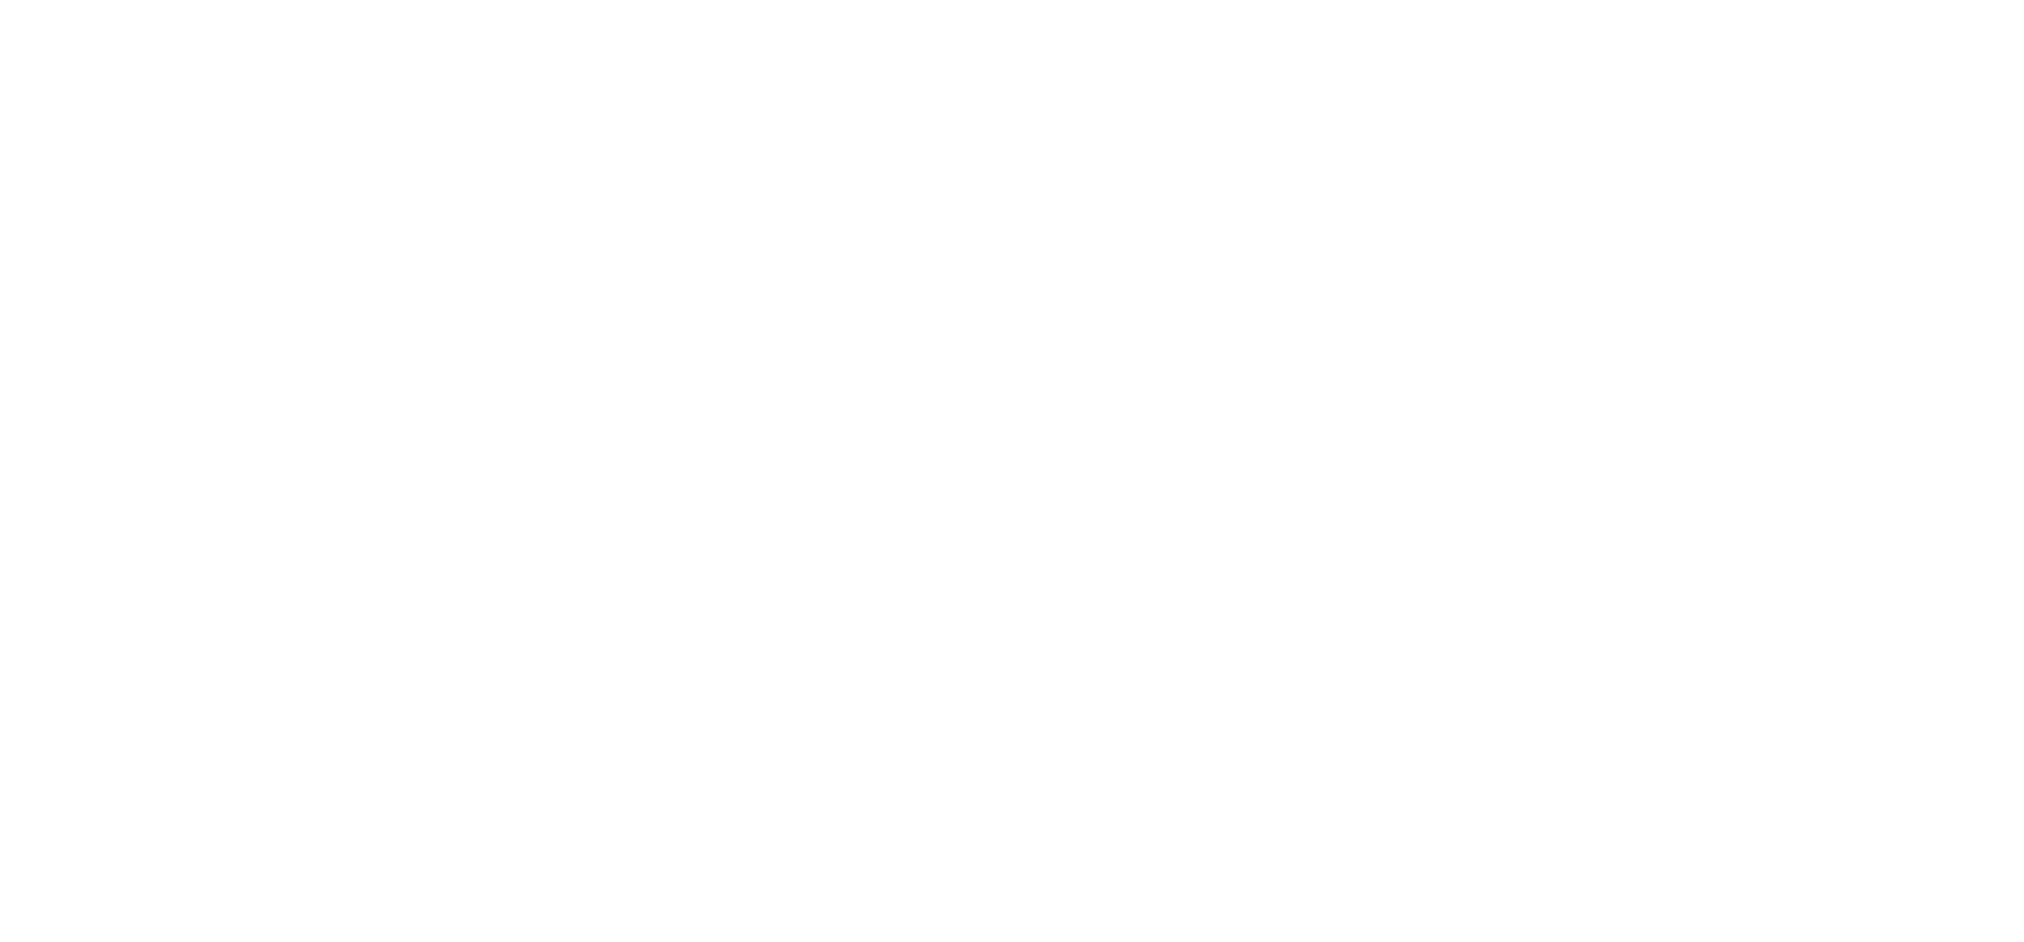 va-kalender-bhnenbild